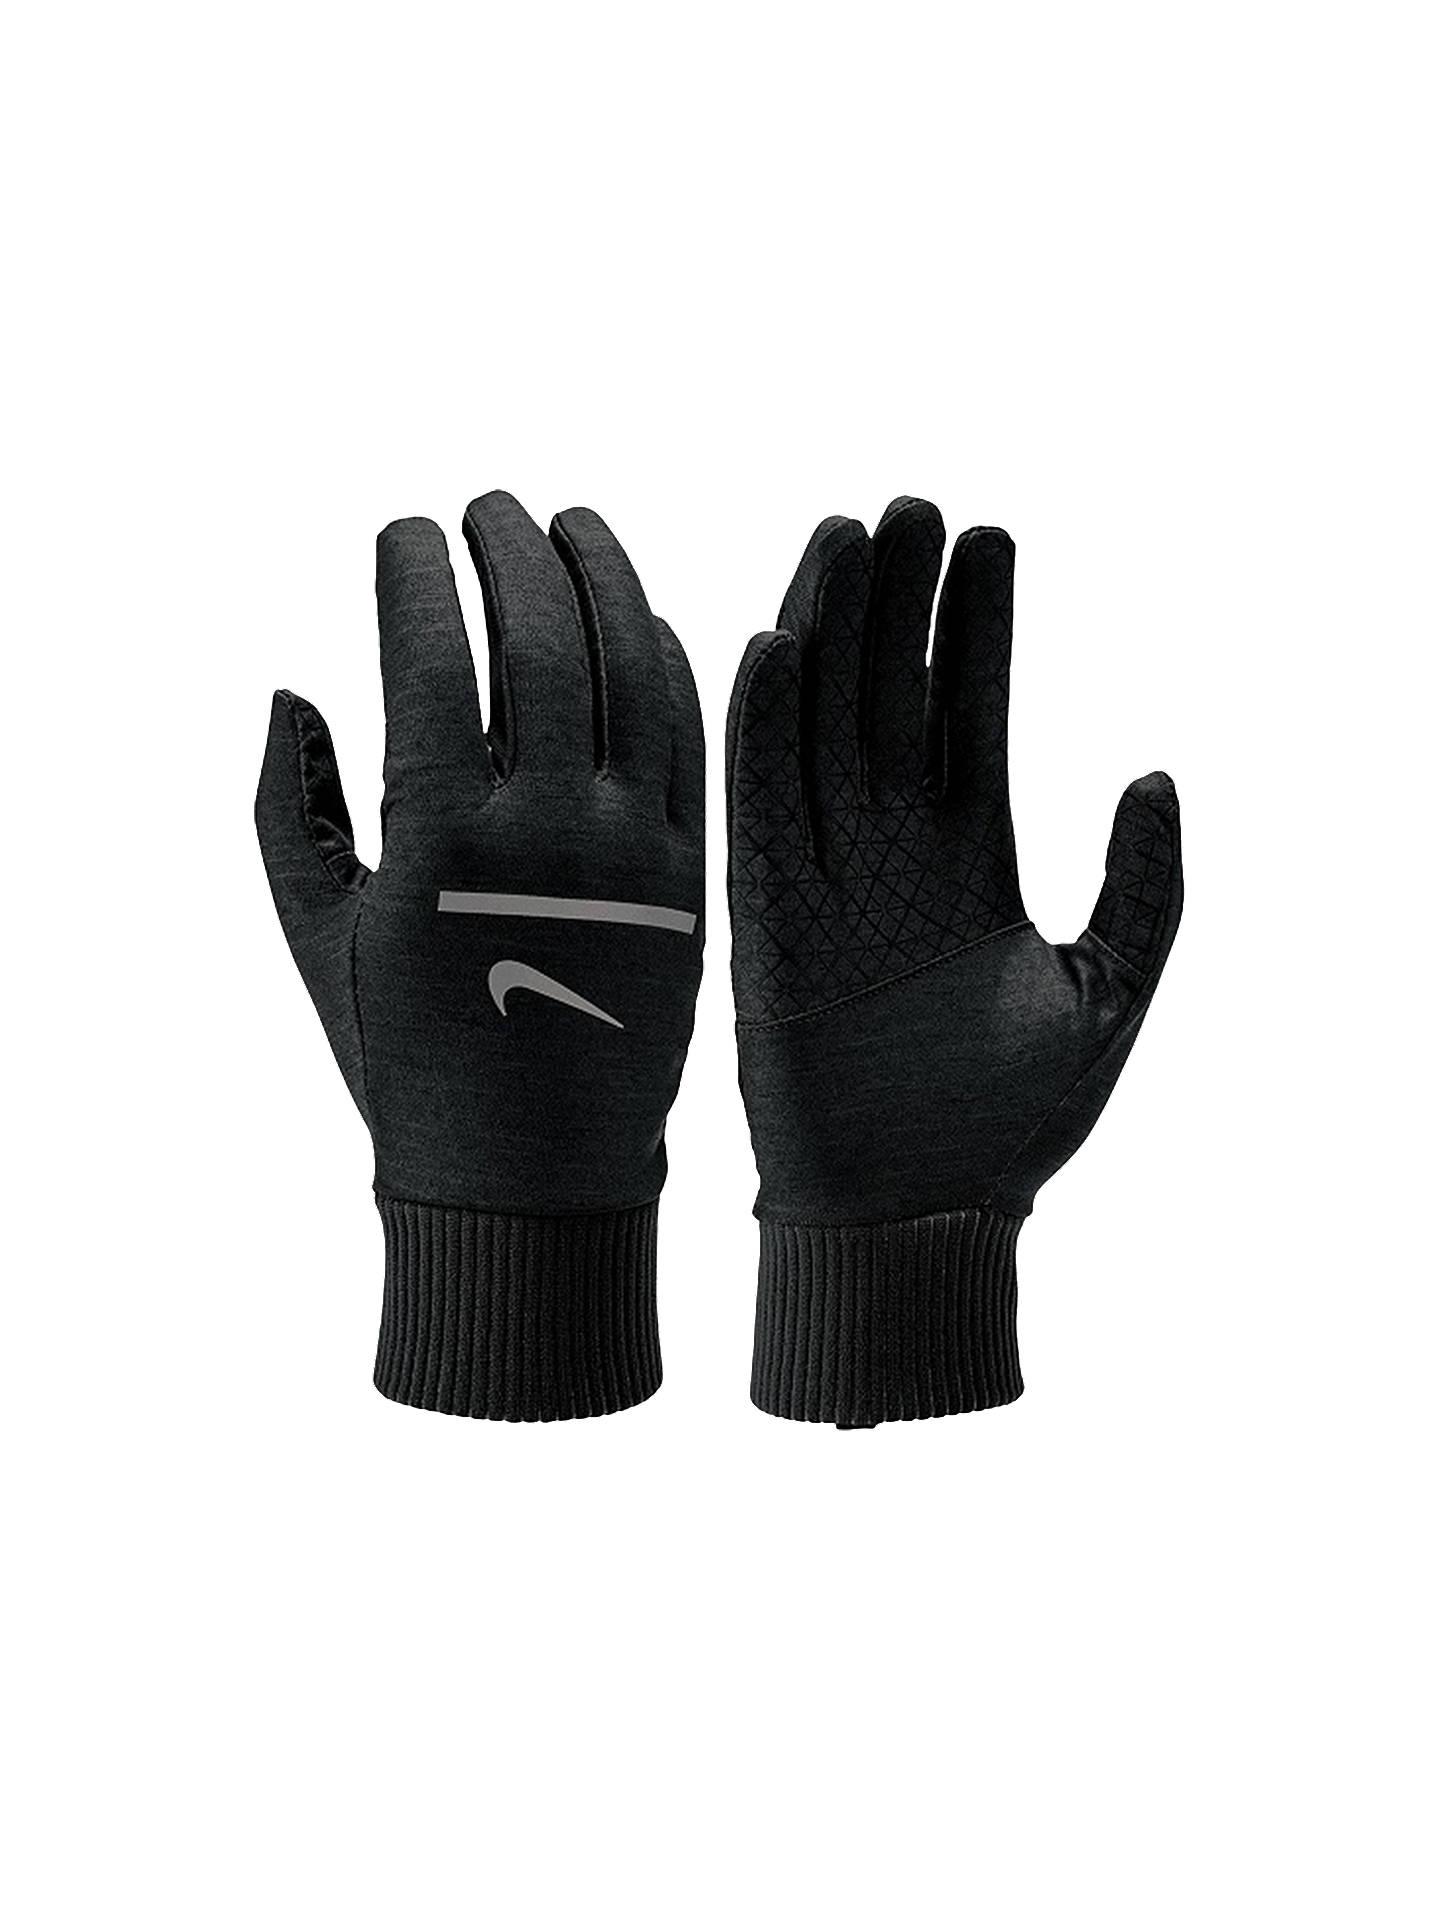 d6dad7877163 Buy Nike Men s Sphere Running Gloves